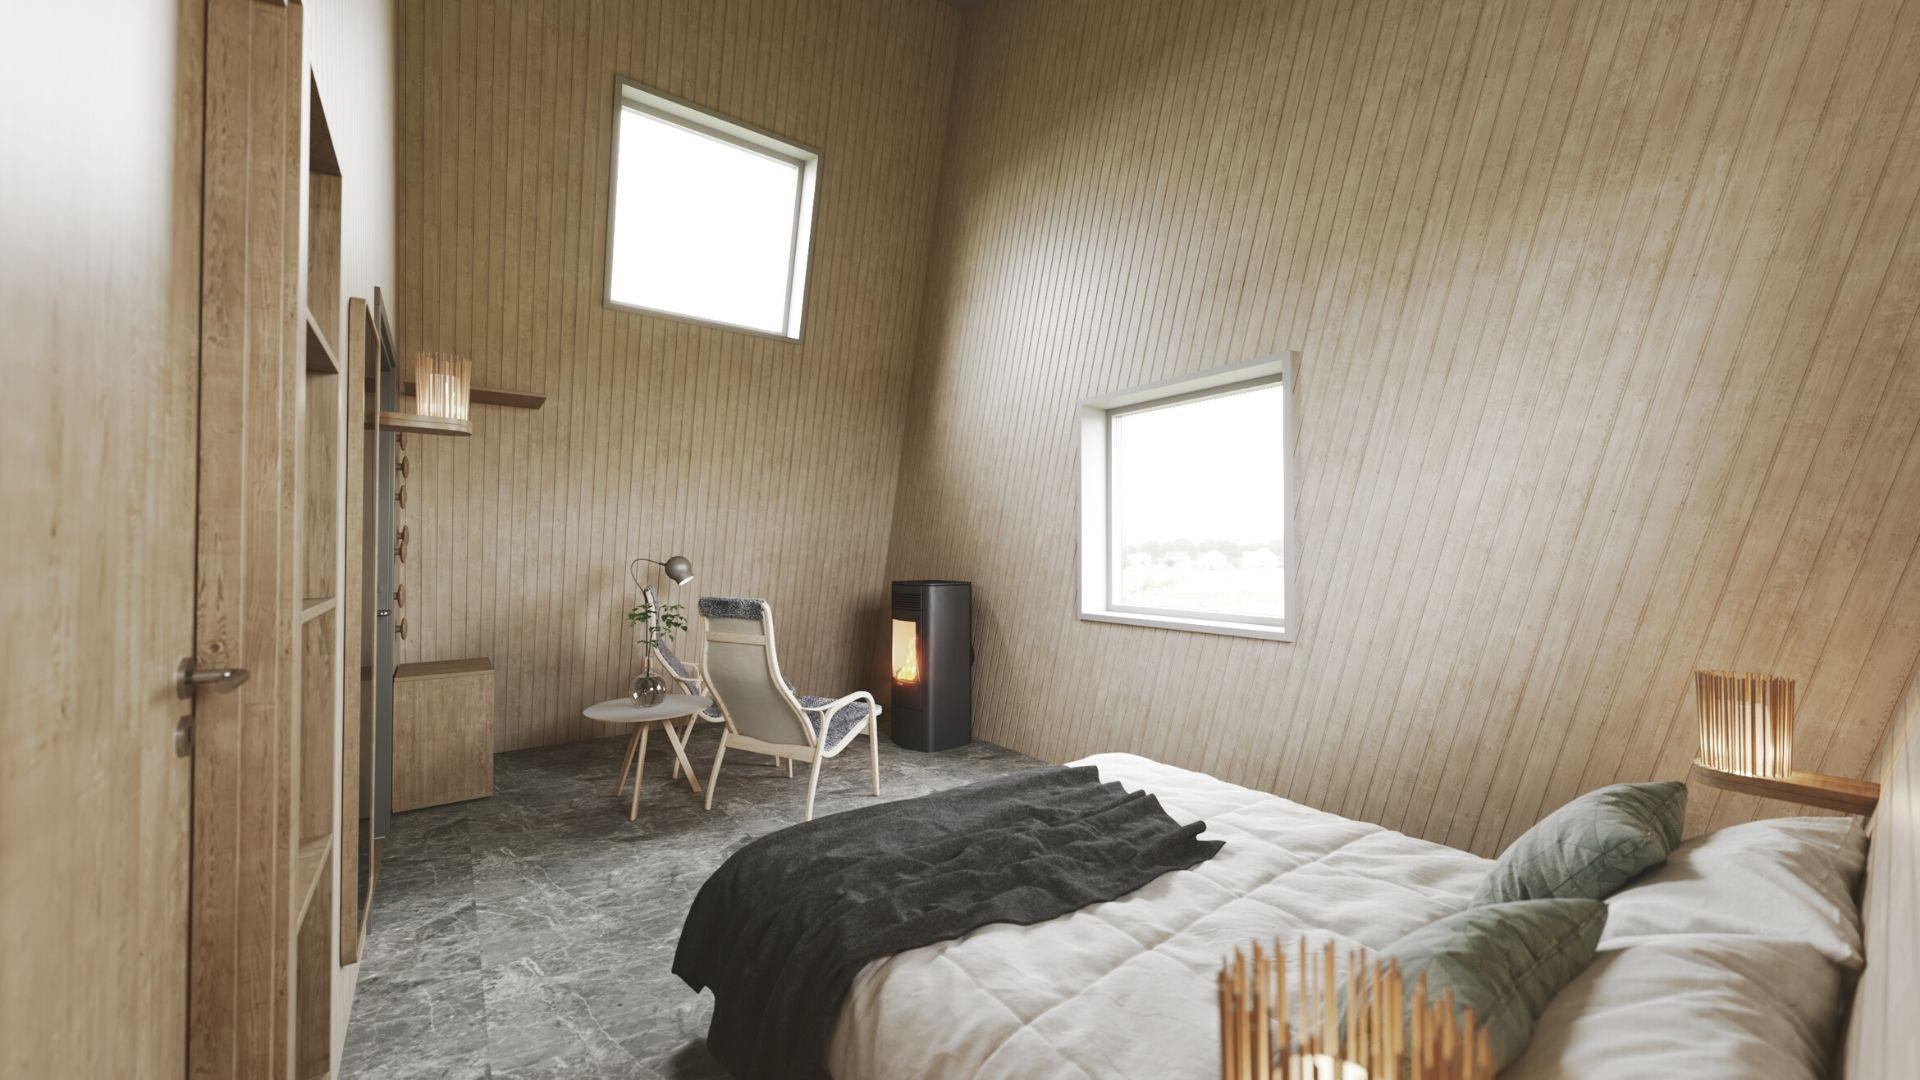 HBA-Arctic-Bath-Sweden-Escape-Lapland-scandinavian-room